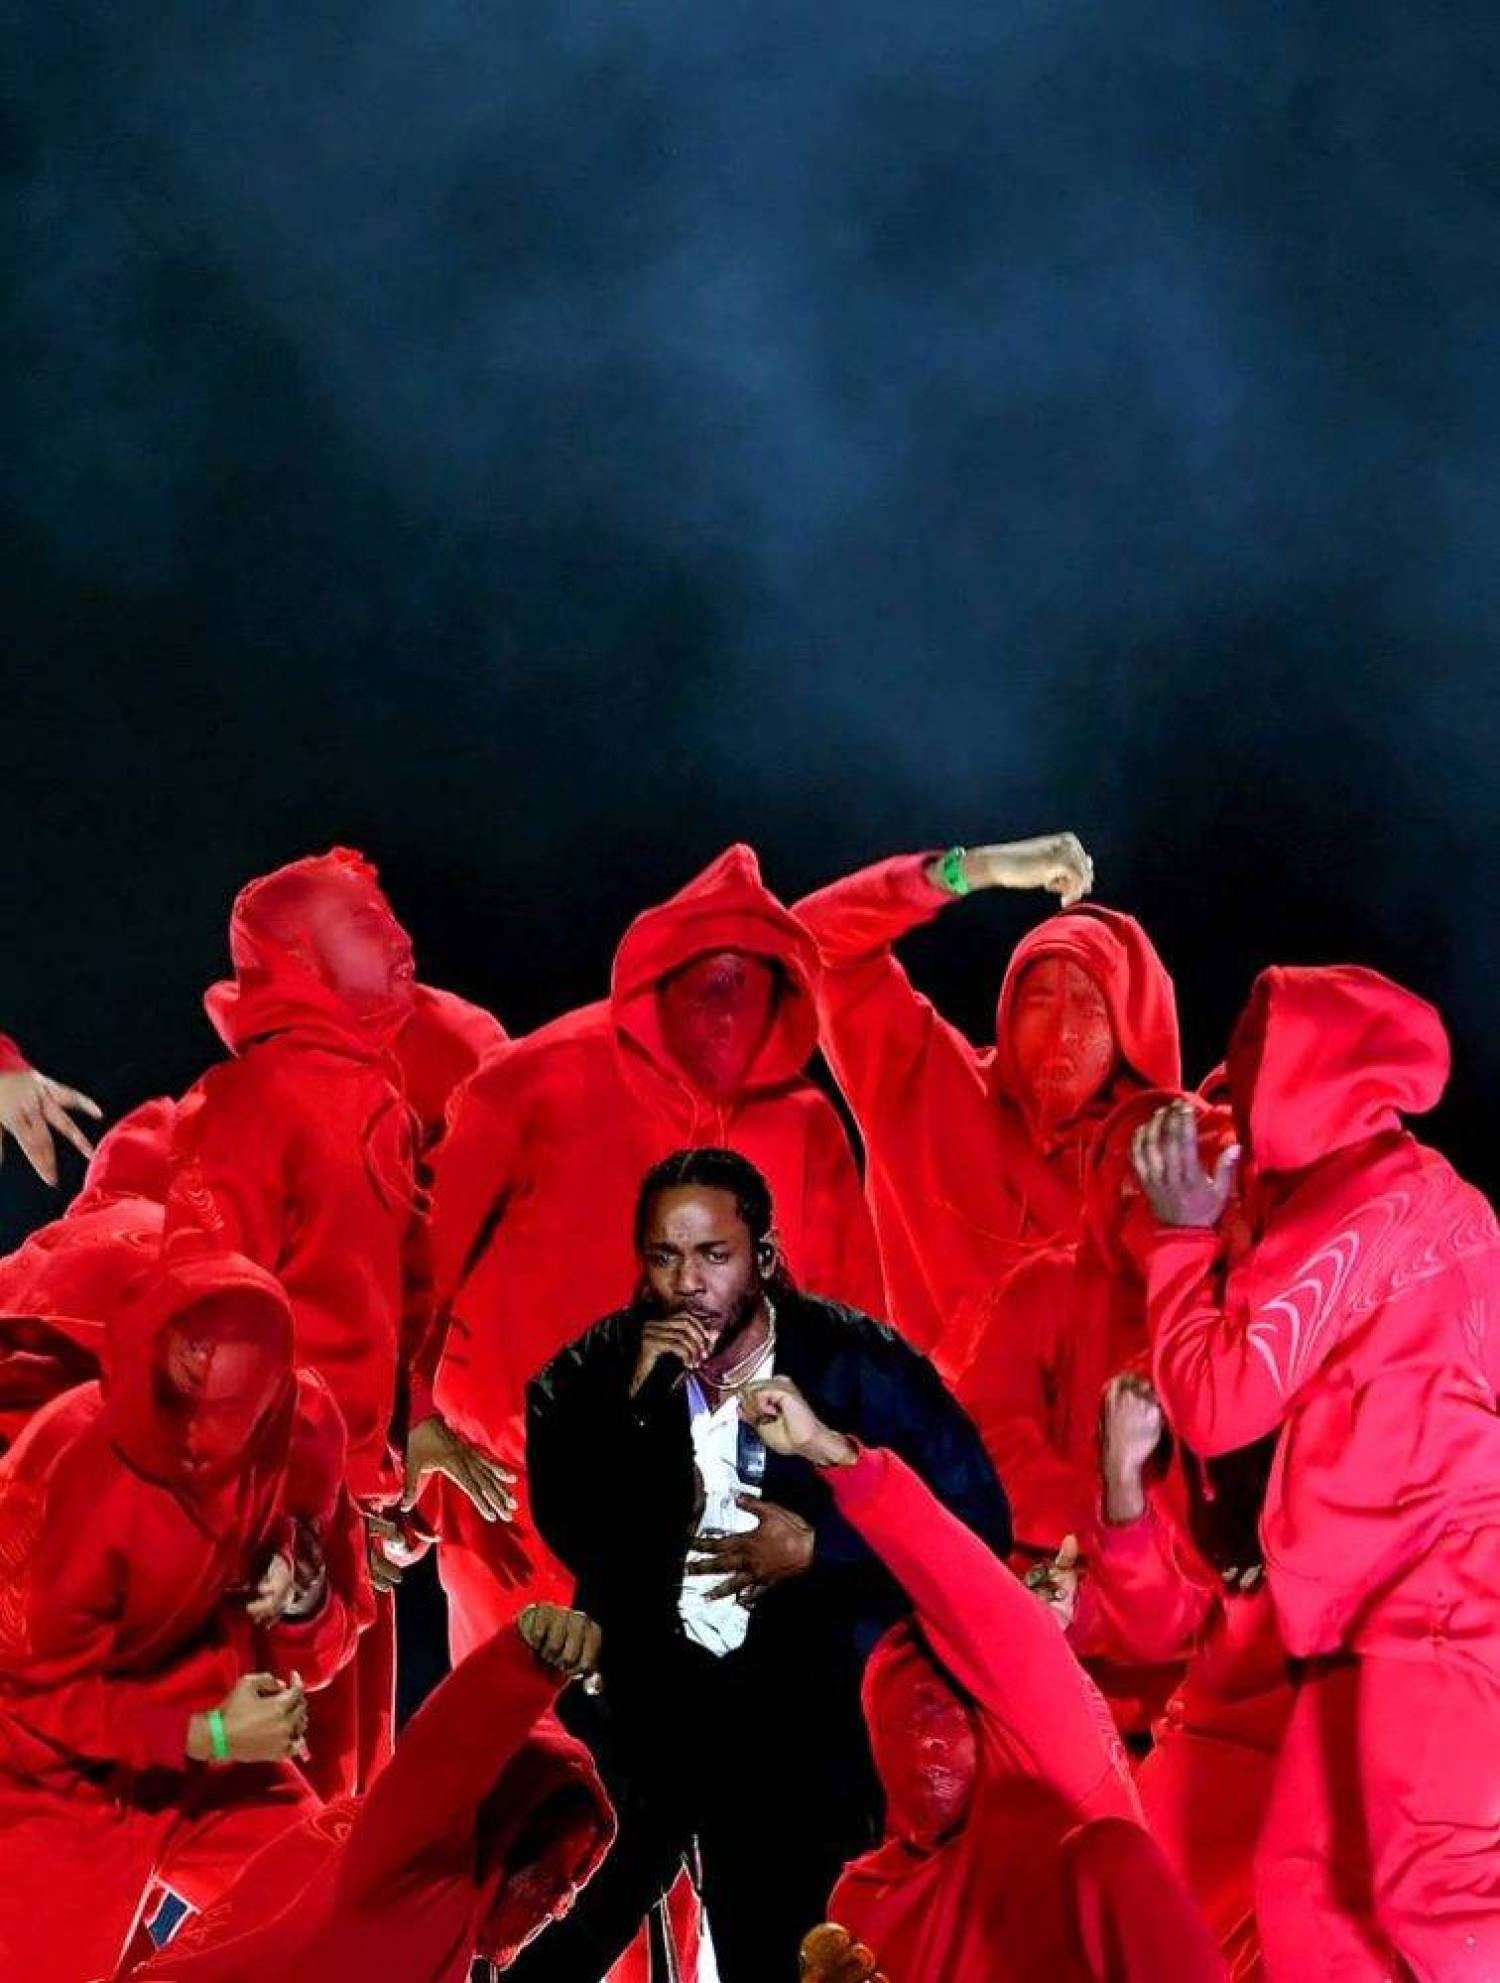 Entertainment News: ScHoolboy Q Relays A Message To Kendrick Lamar On Behalf Of A Fan